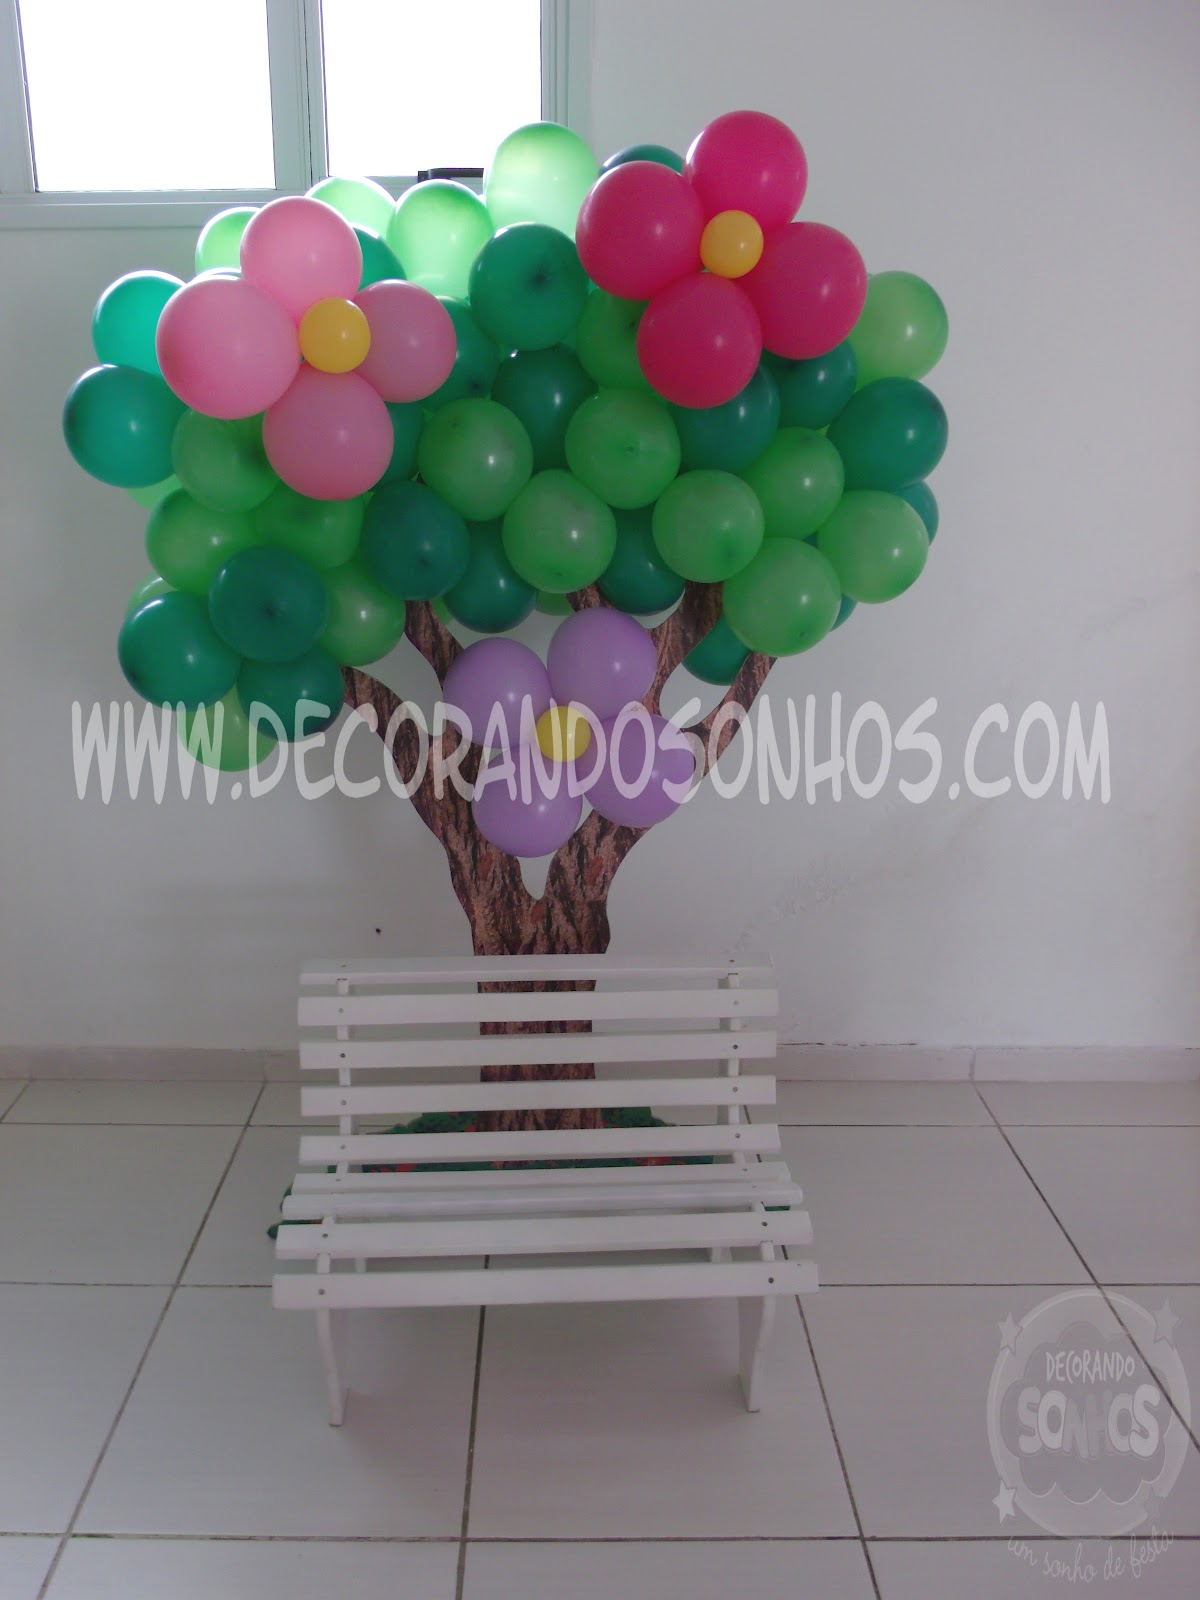 decoracao festa jardim encantado provencal:jardim+encantado+decoracao+provencal+jardim+encantado+decoracao+festa